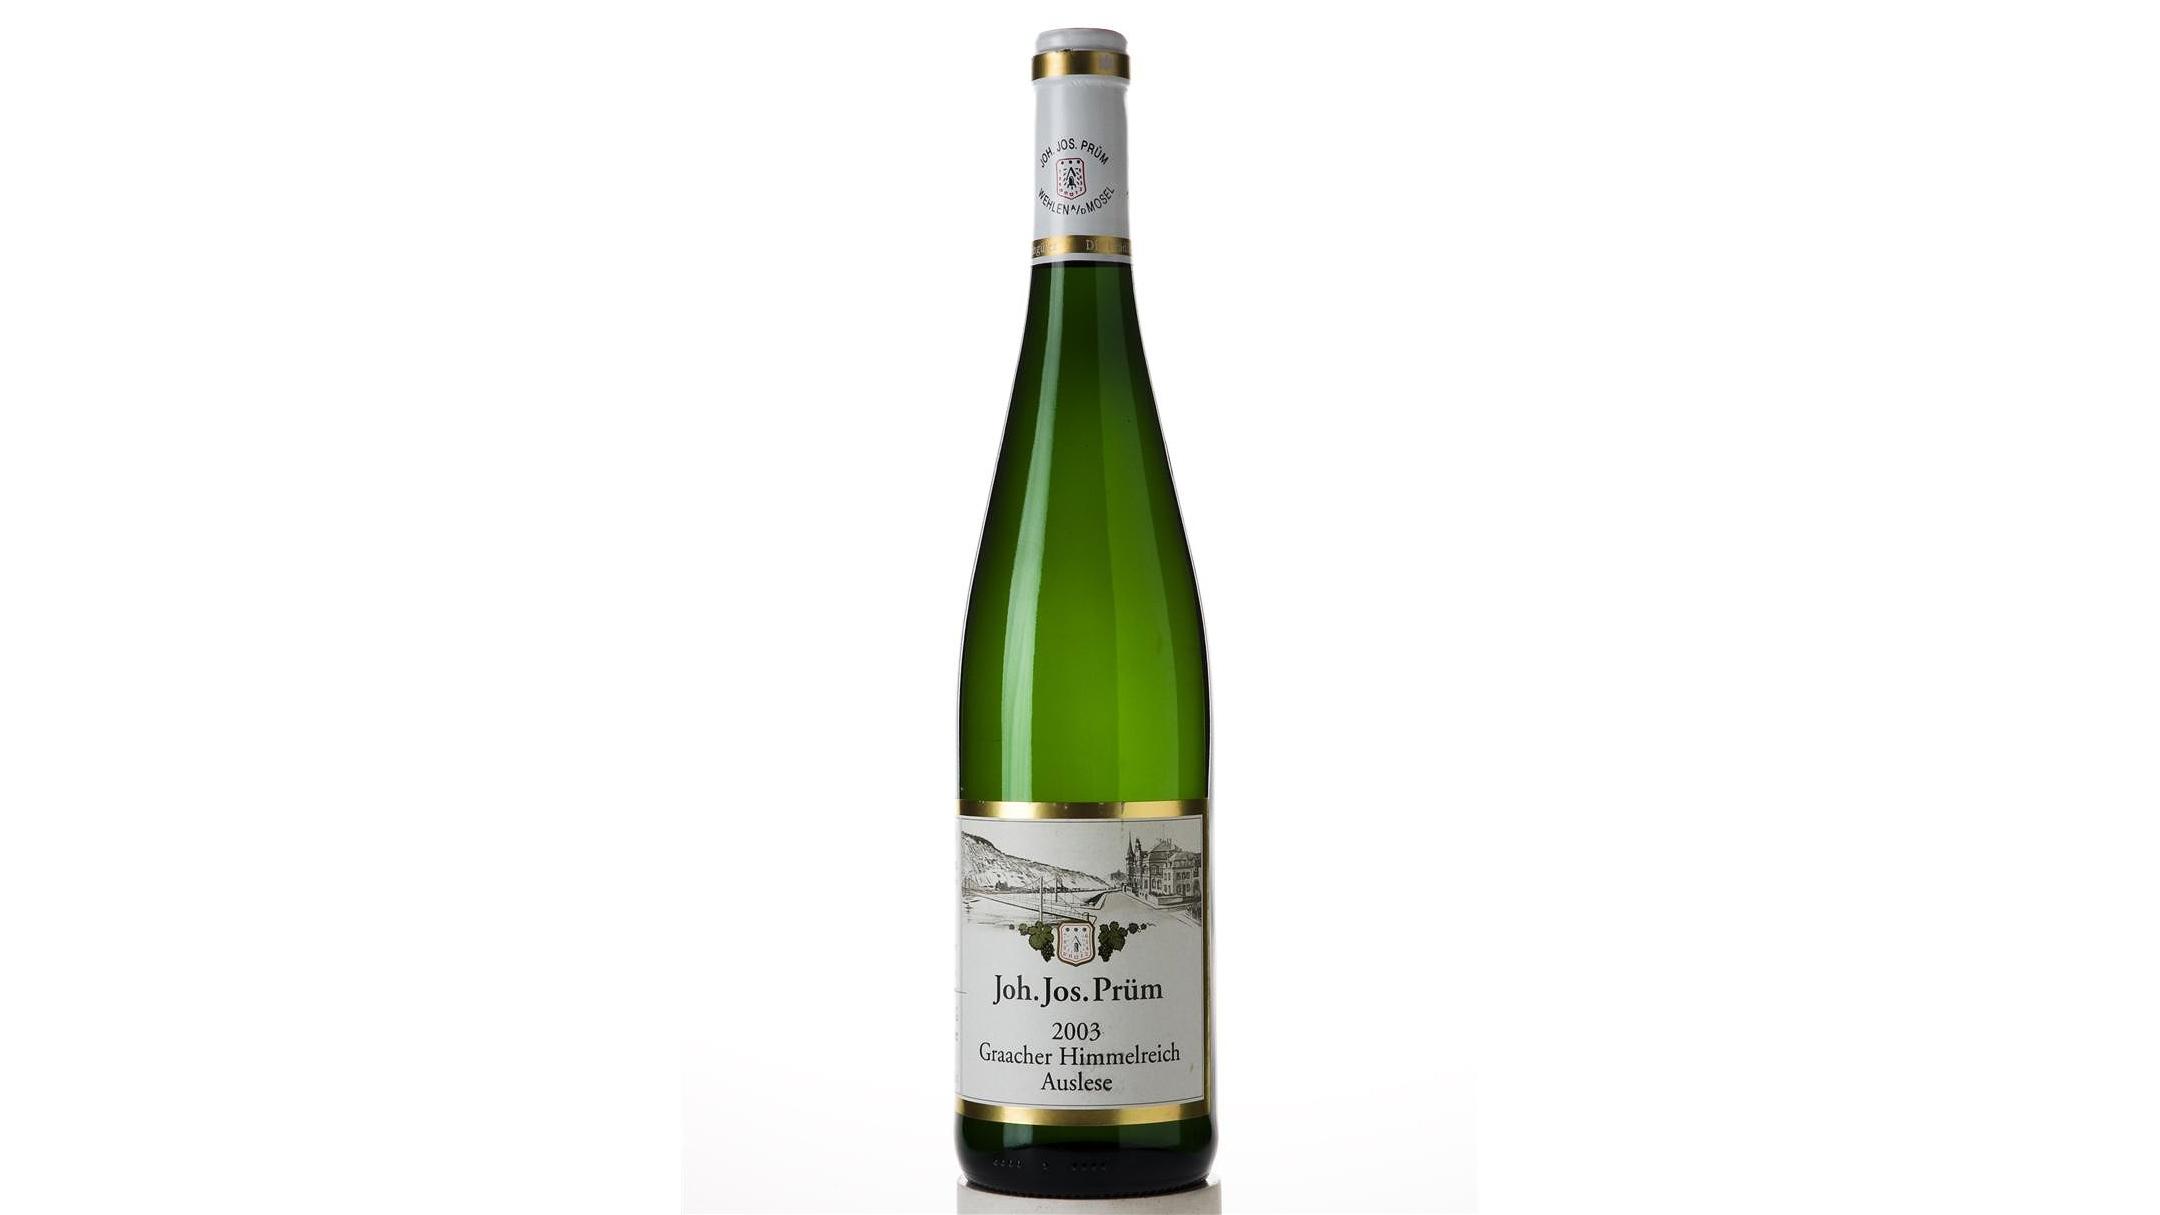 special occasion wines joh jos prum